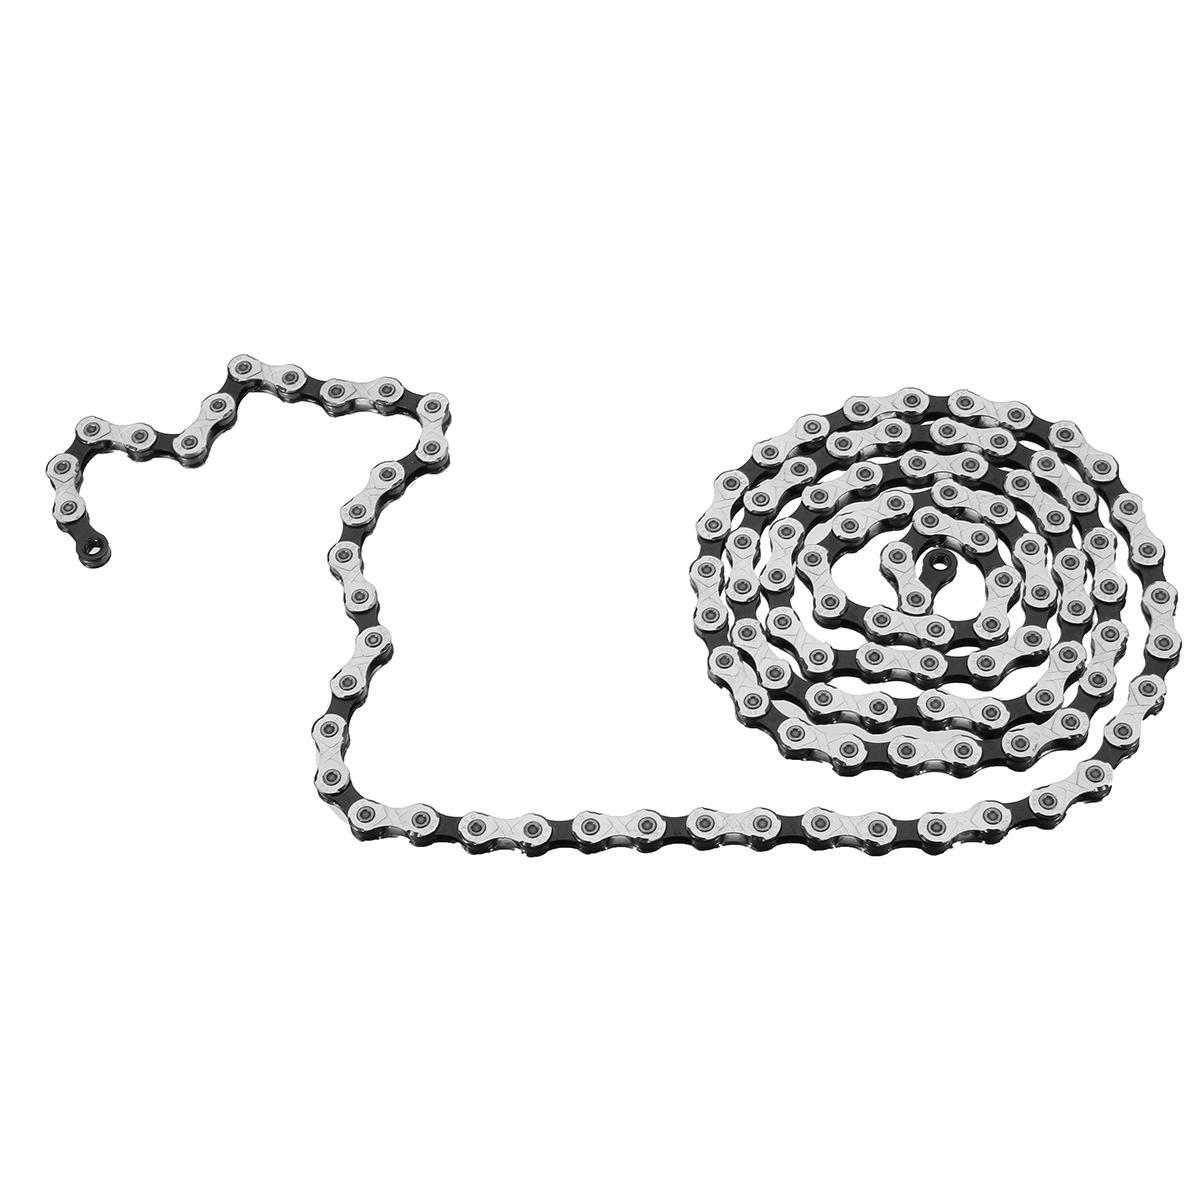 Bikight Bike Chain 10 Speed 116 Links Silver For Shimano Sram 10x Mtb Systems Sale